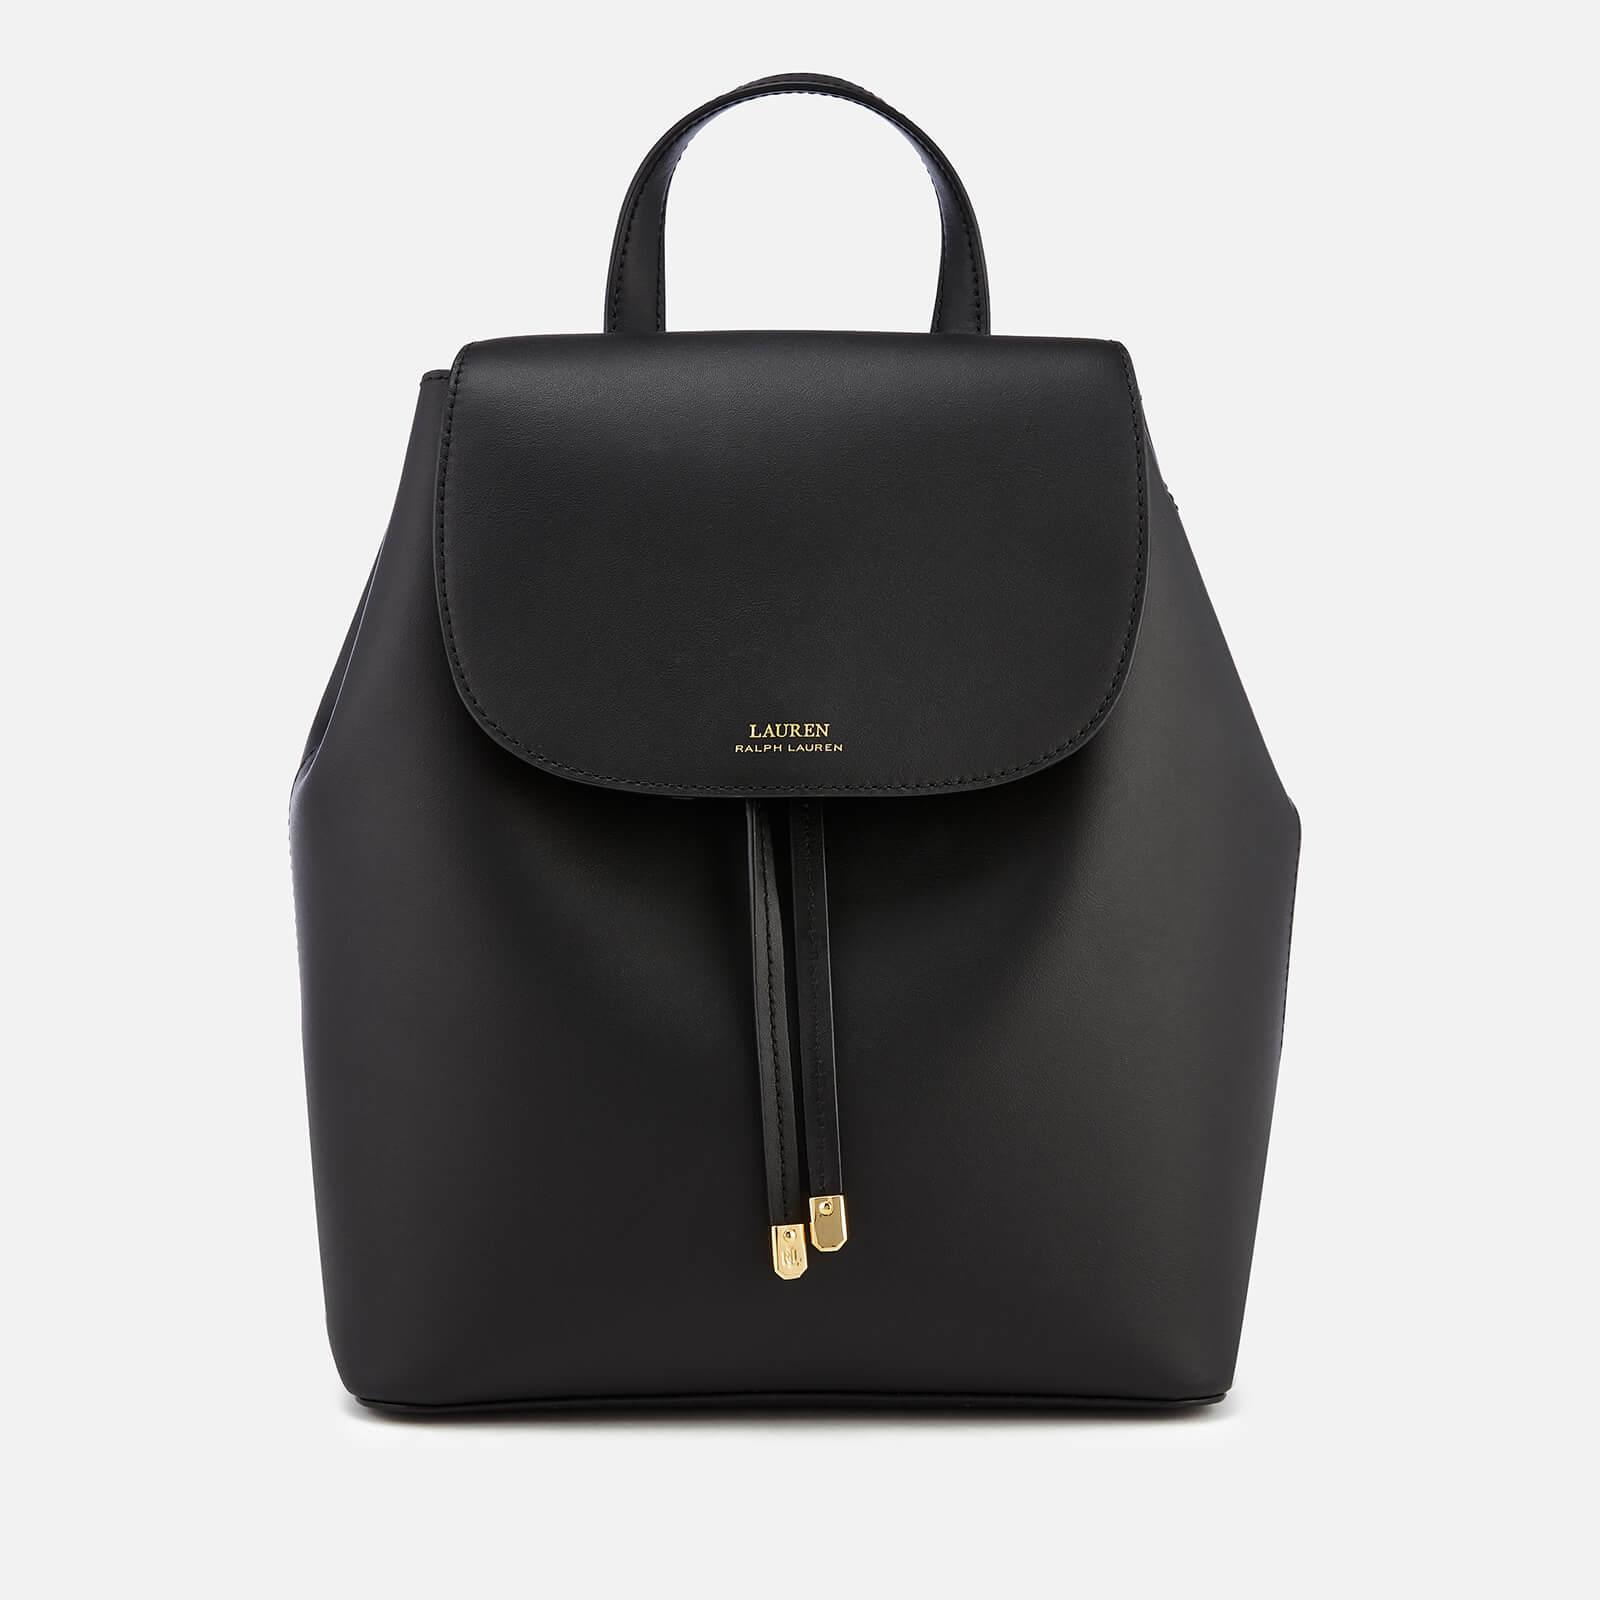 4d5829b76c Lauren Ralph Lauren Women's Dryden Flap Medium Backpack - Black/Crimson